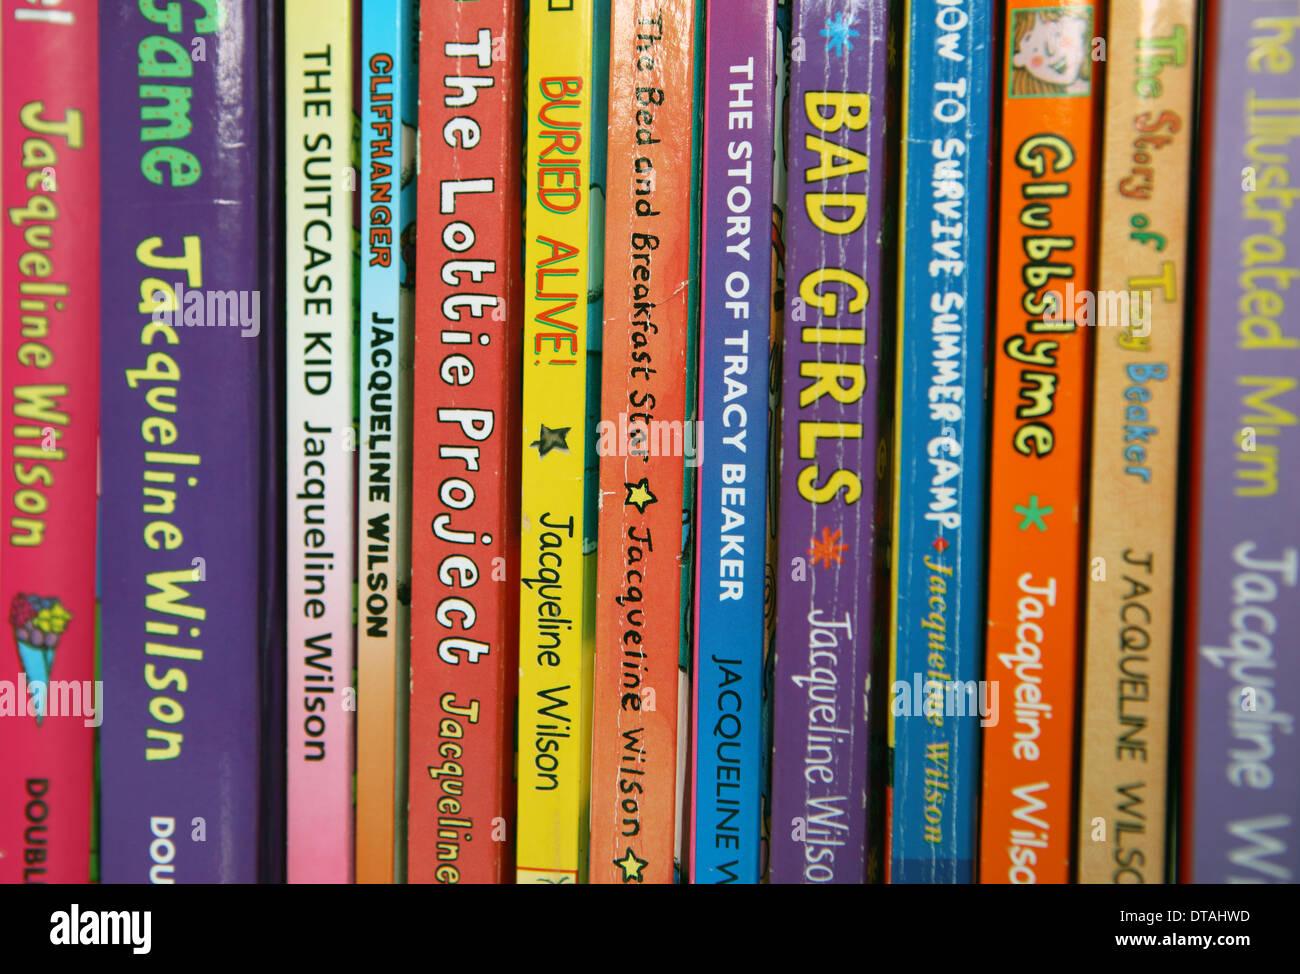 Jacqueline Wilson Children S Books On A Shelf Stock Photo